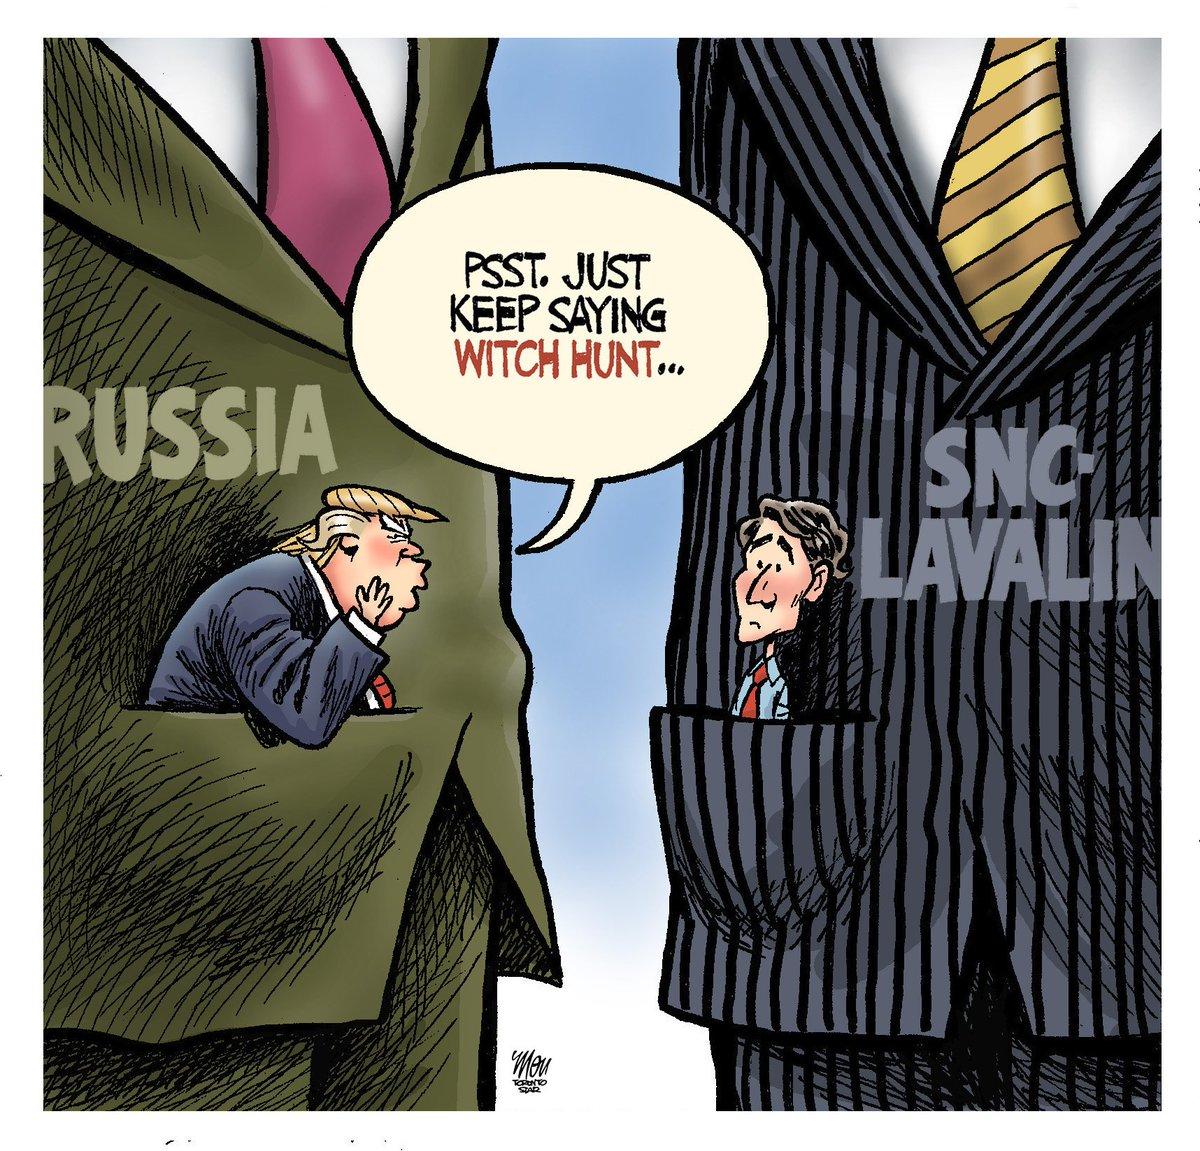 Here's today's #SNCLavalin cartoon in @TorontoStar #cdnpoli